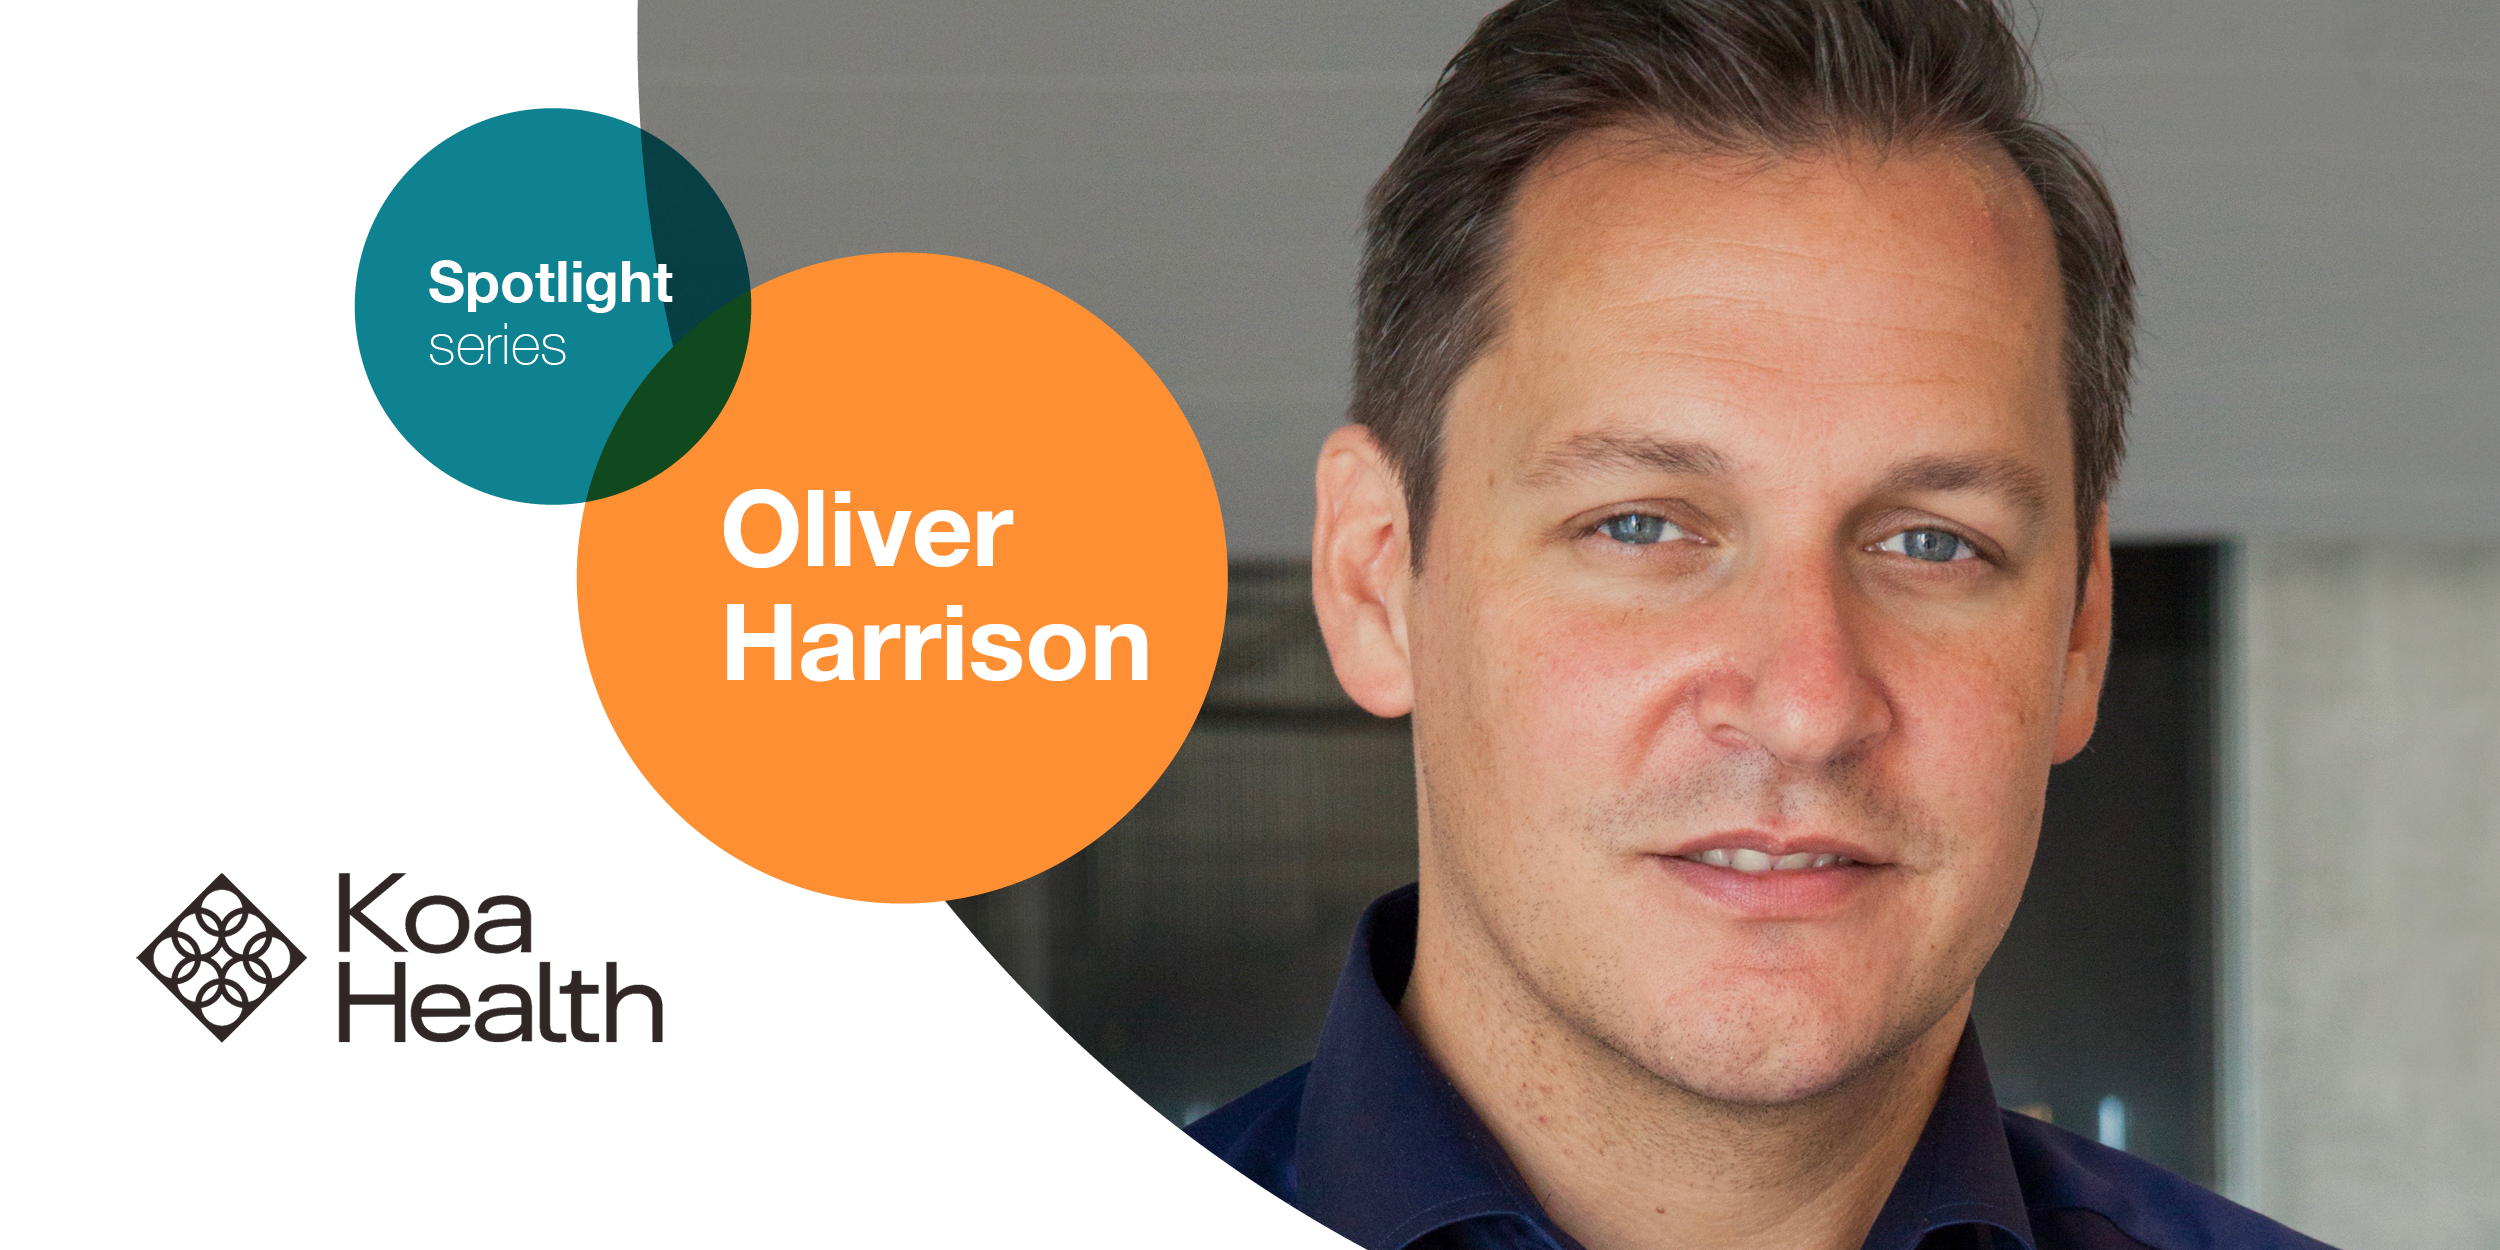 Oliver Harrison of KOA Health